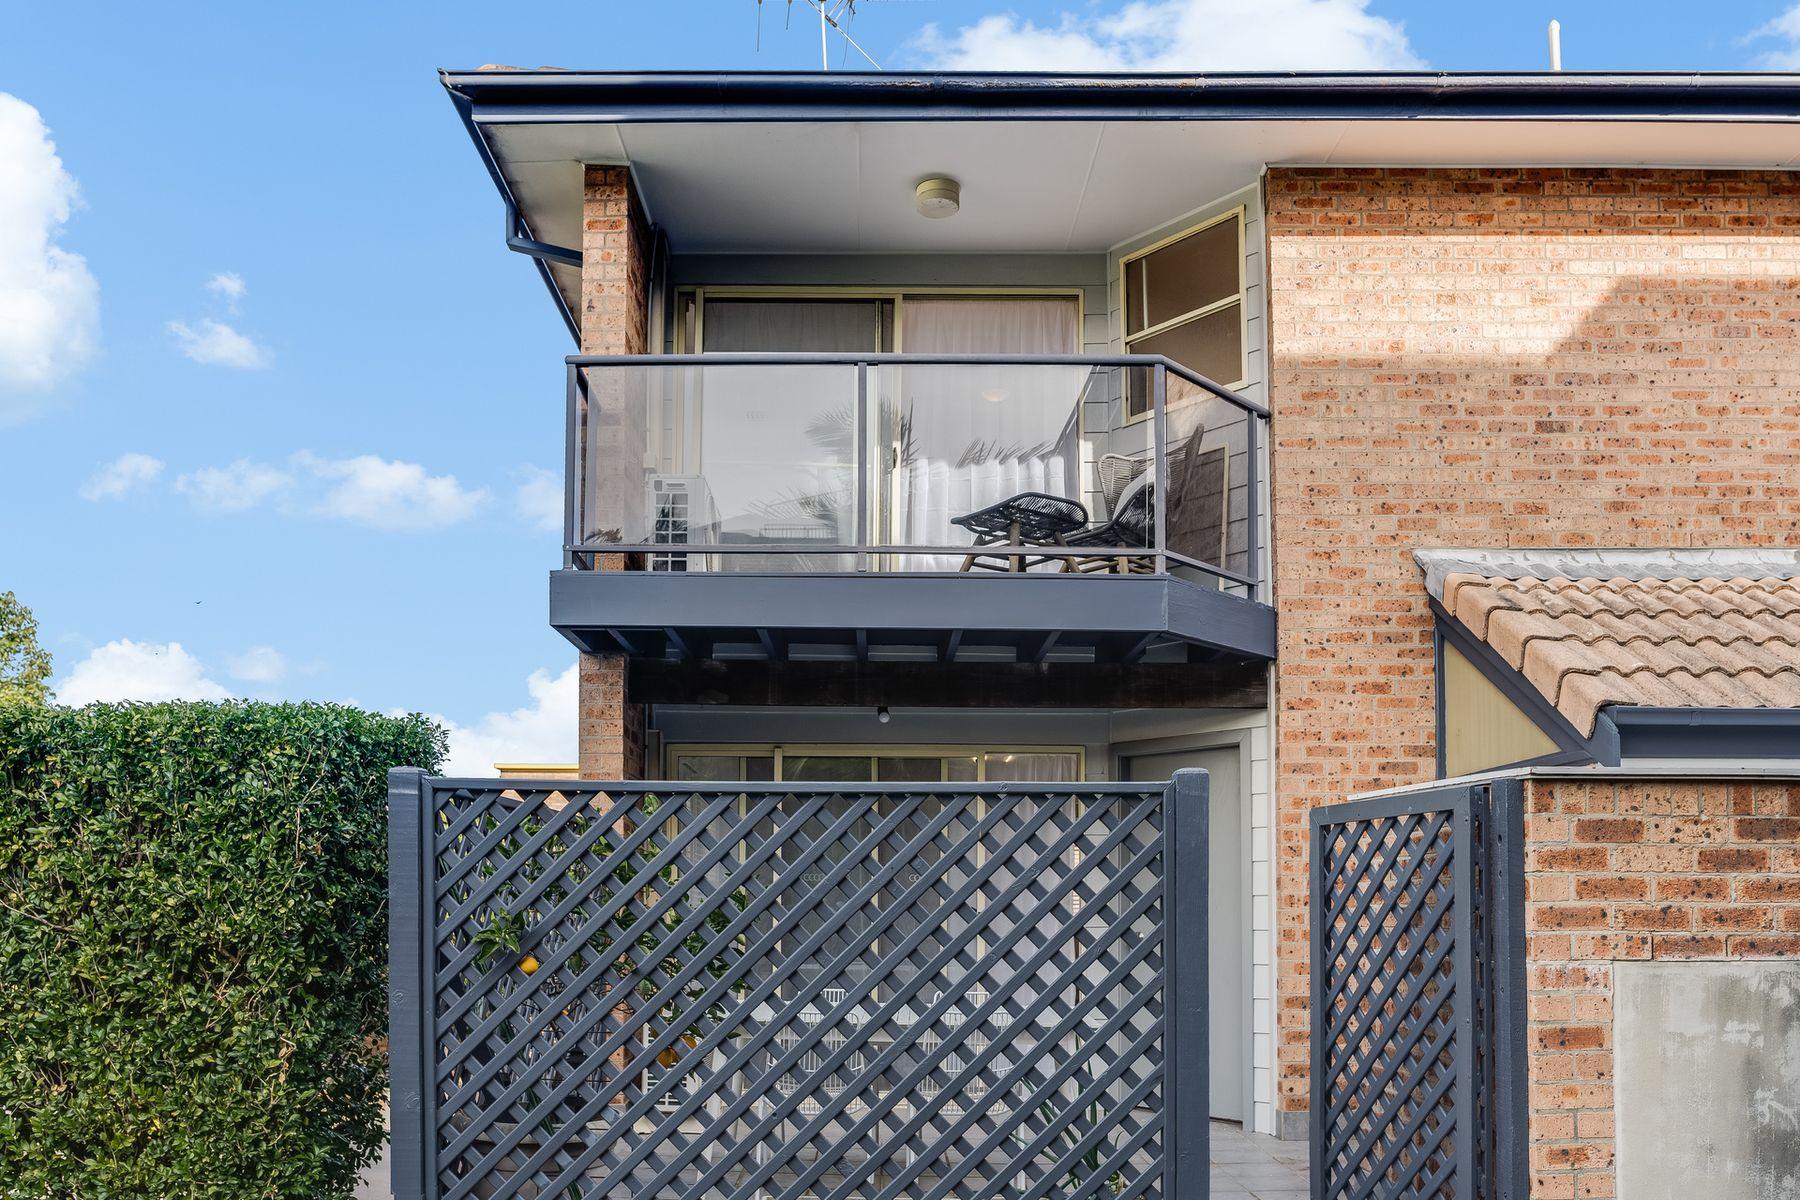 20/112 Tyrrell Street, The Hill, NSW 2300